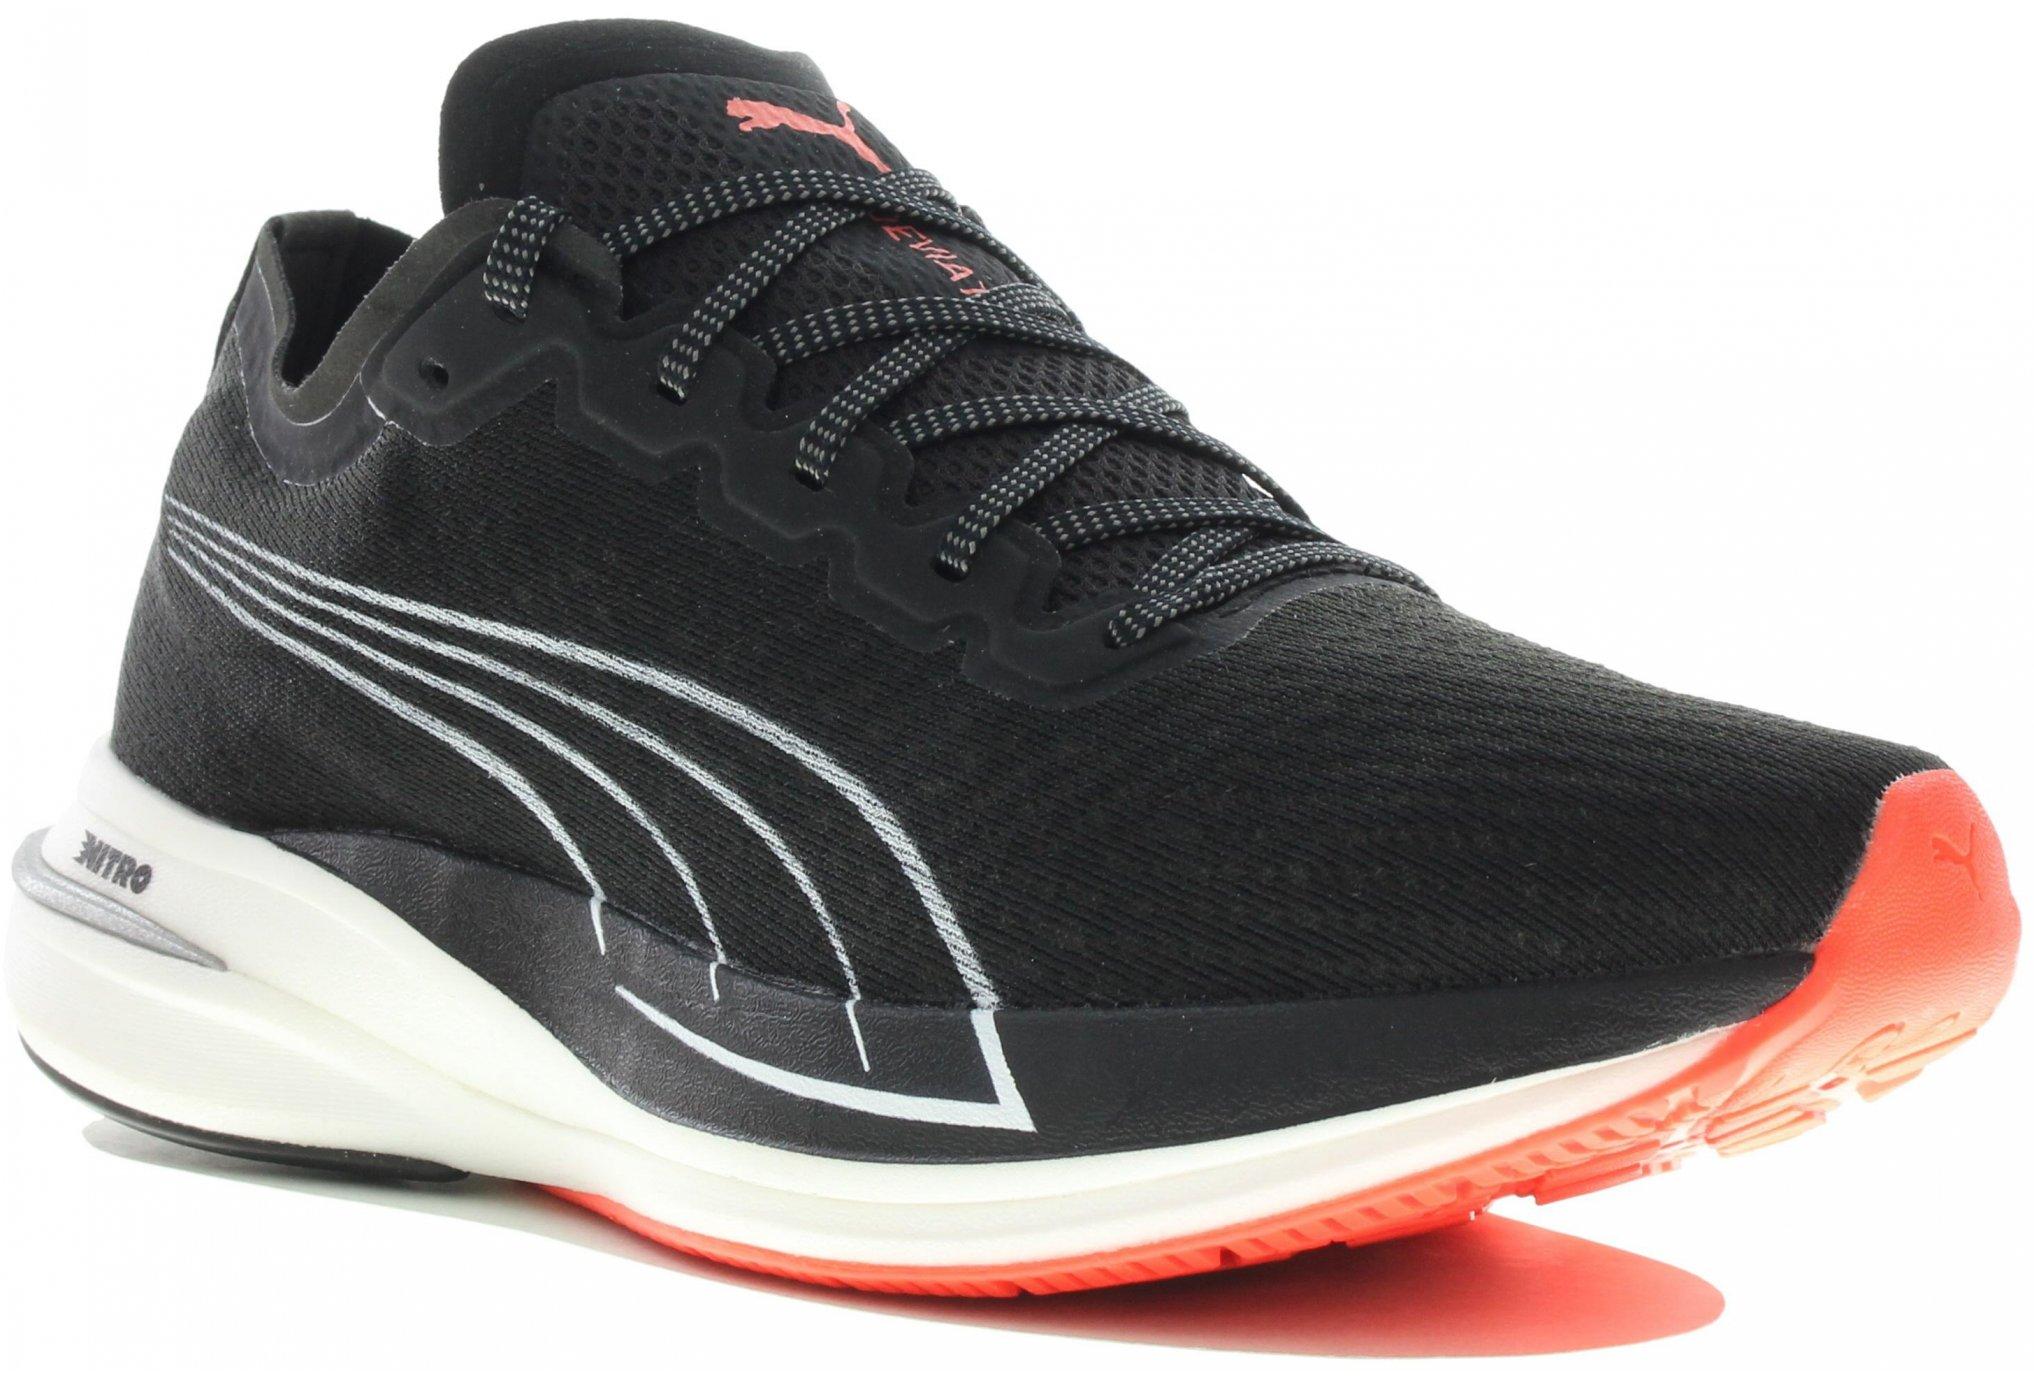 Puma Deviate Nitro W Chaussures running femme